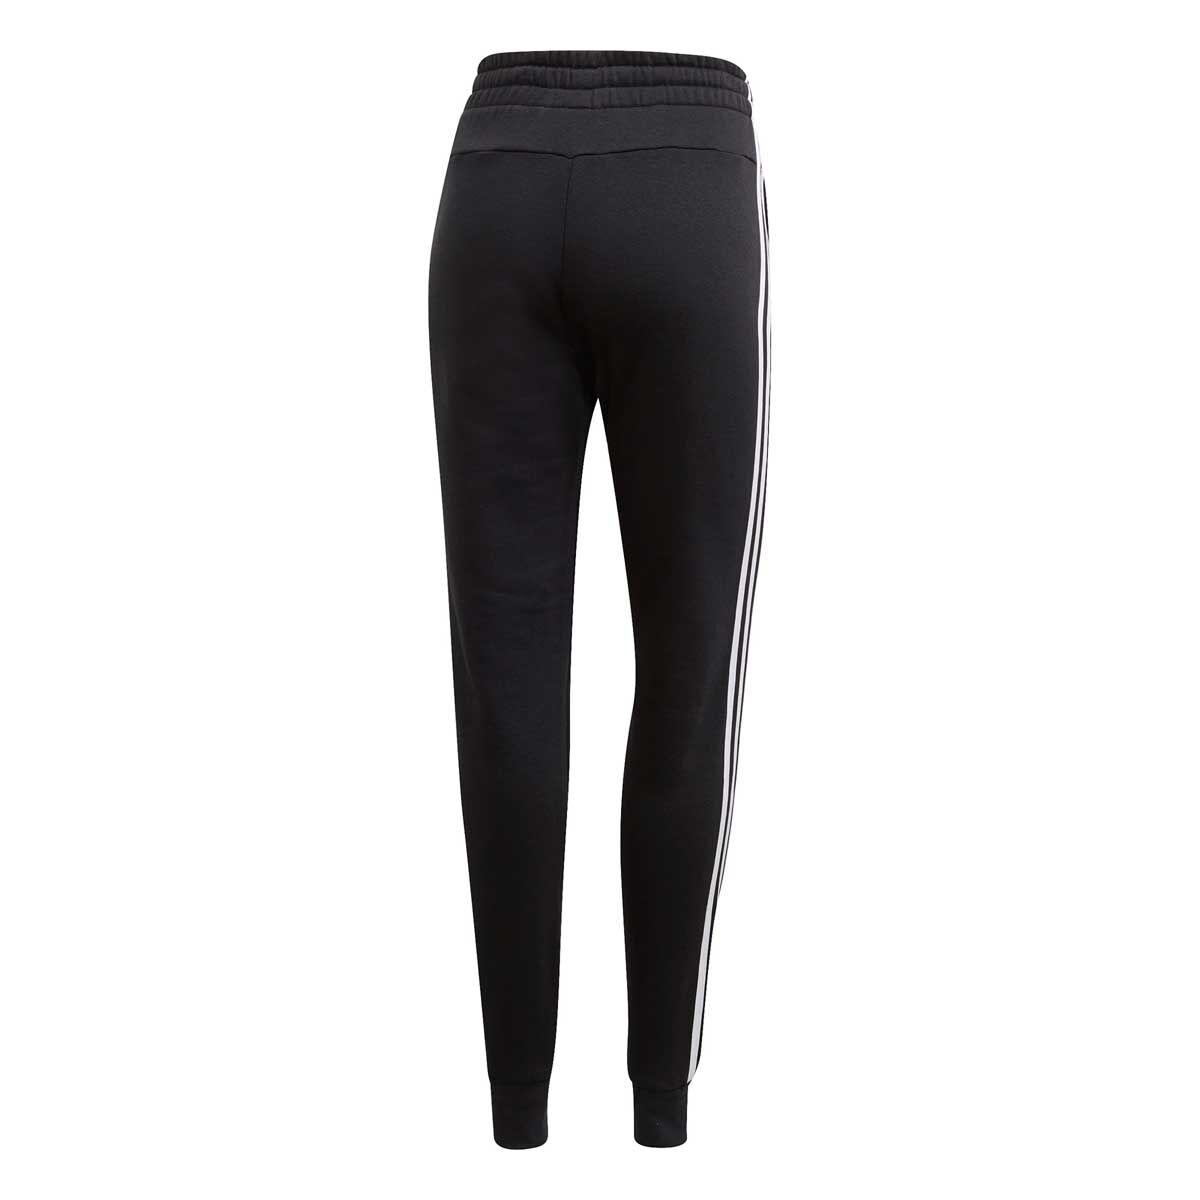 adidas Womens Athletics Essentials Cotton Fleece 3 Stripes